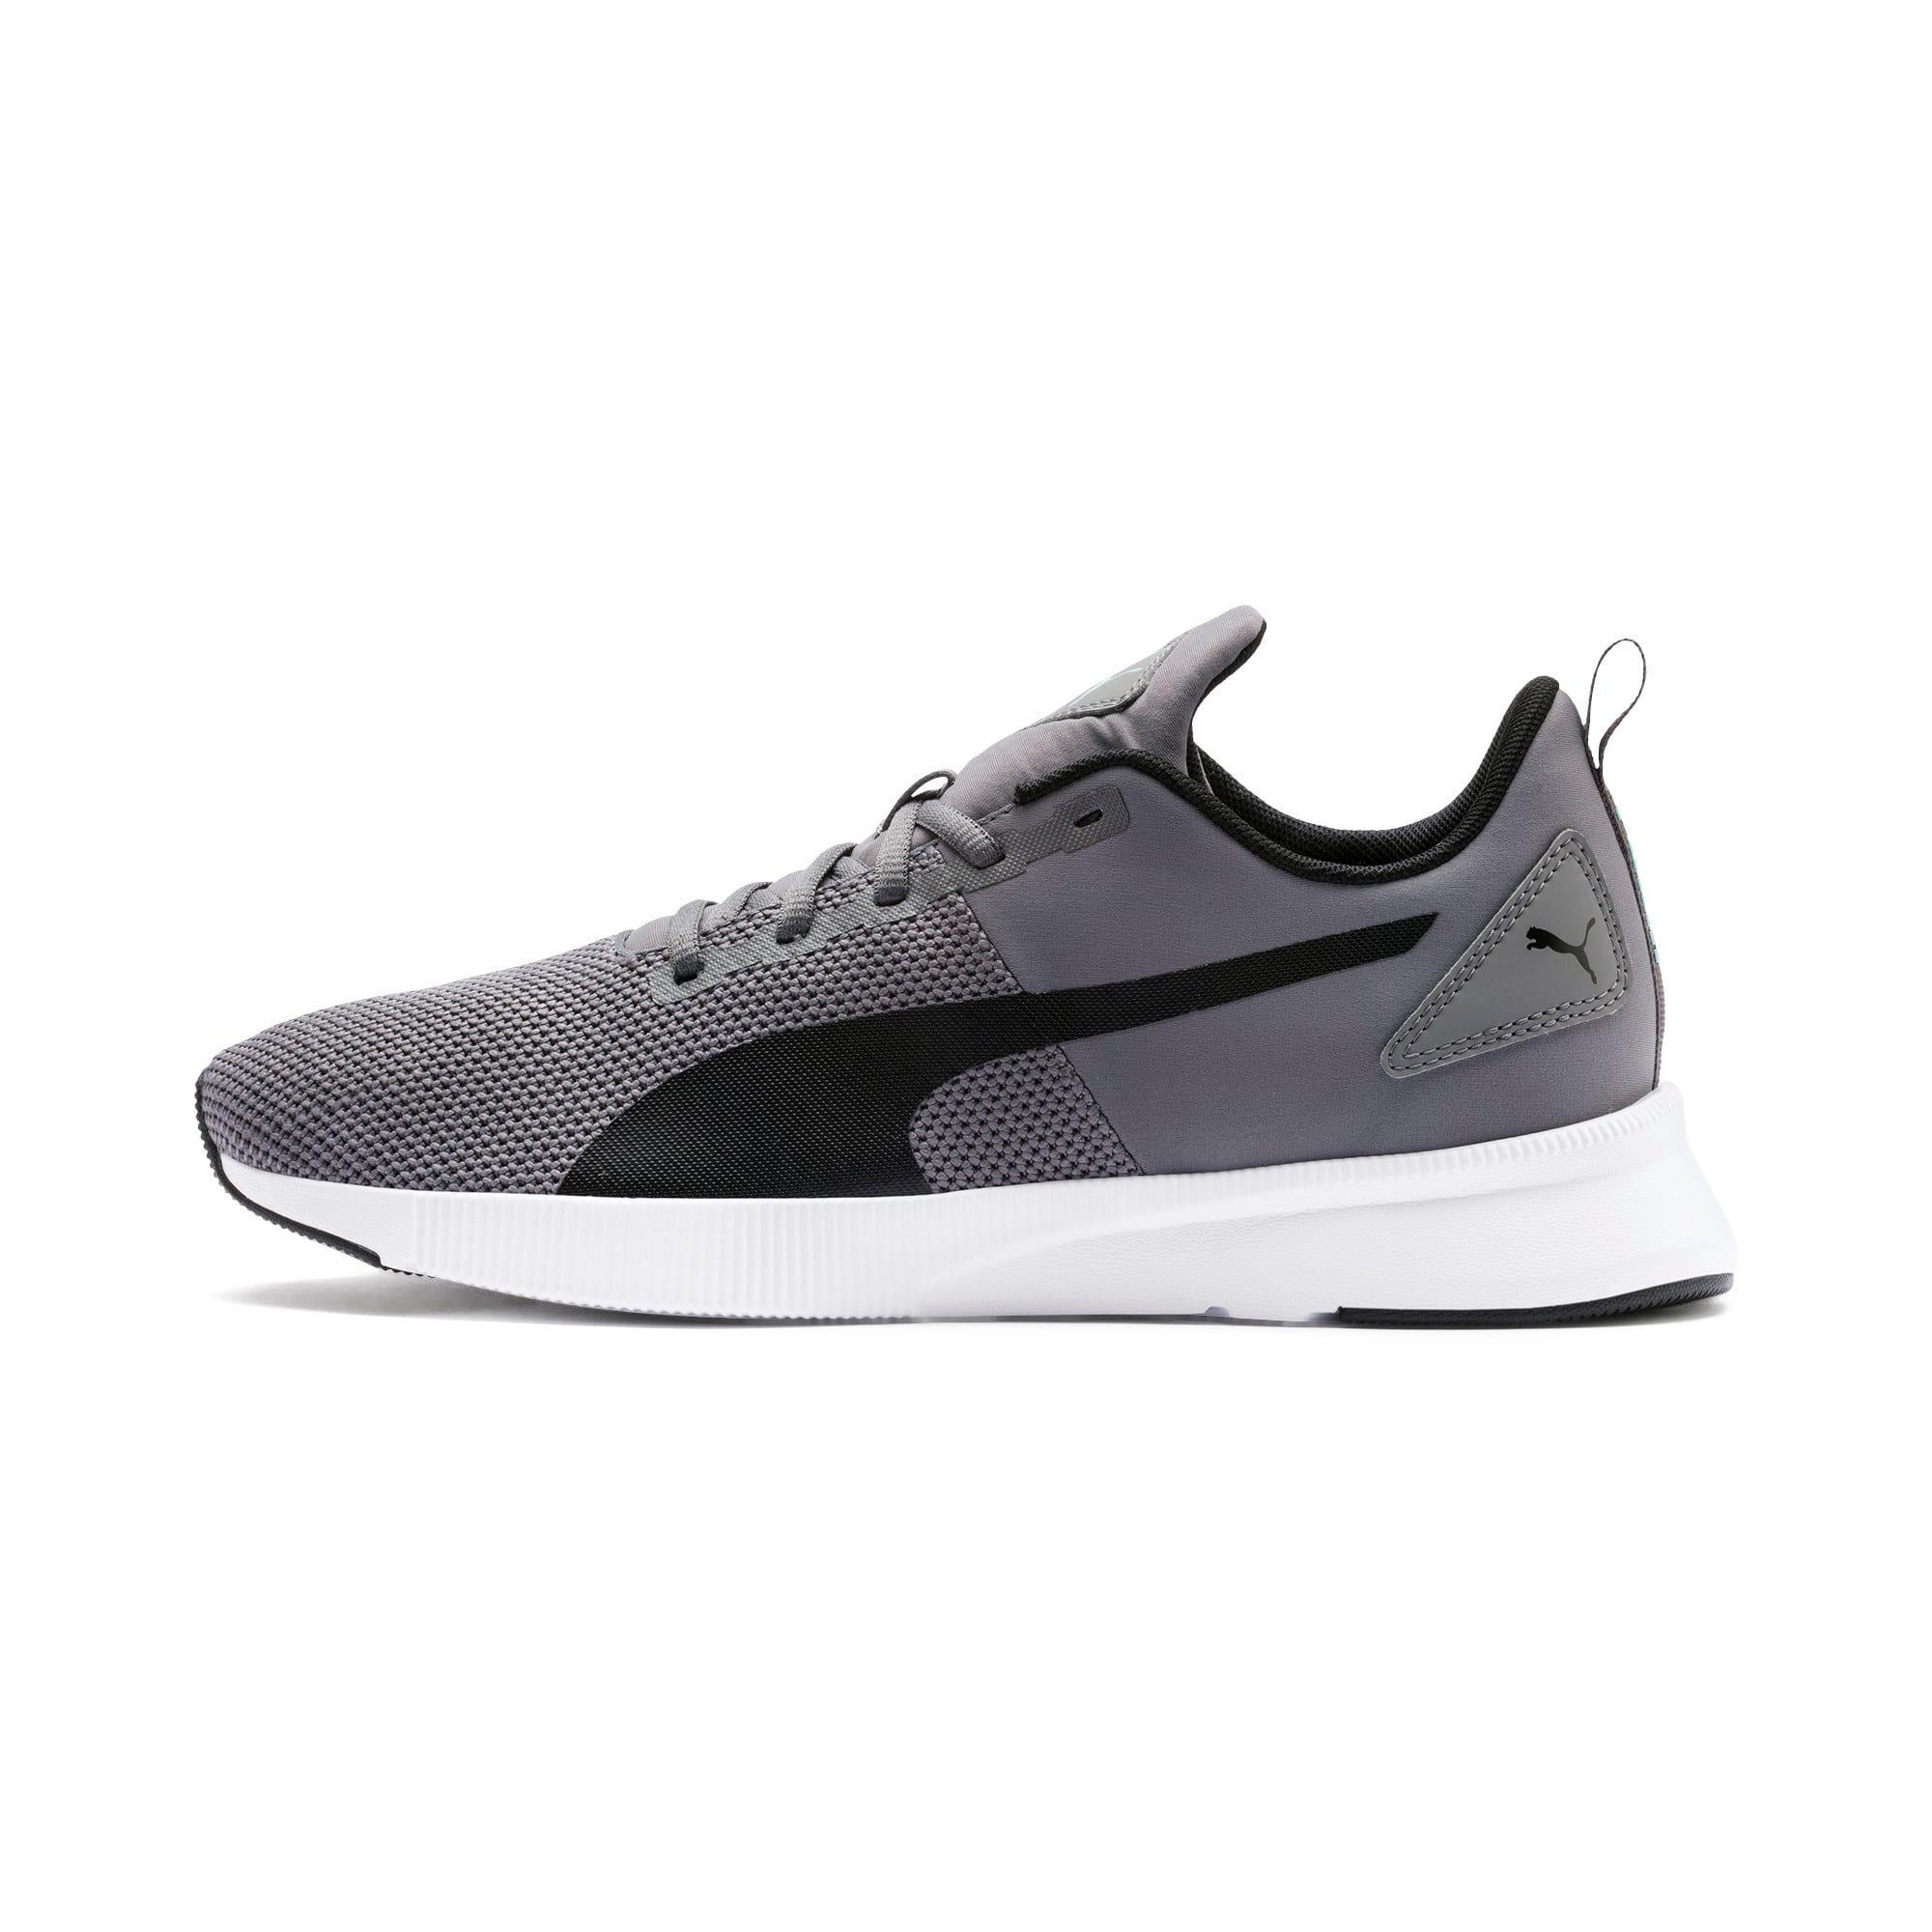 Thumbnail 1 of Flyer Runner Running Shoes, Charcoal-Black-Turquoise, medium